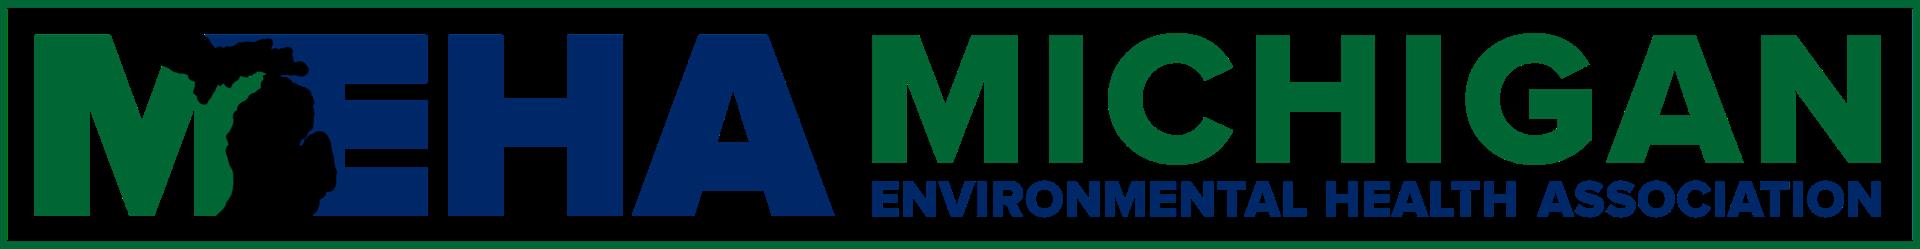 Michigan Environmental Health Association - Join or Renew